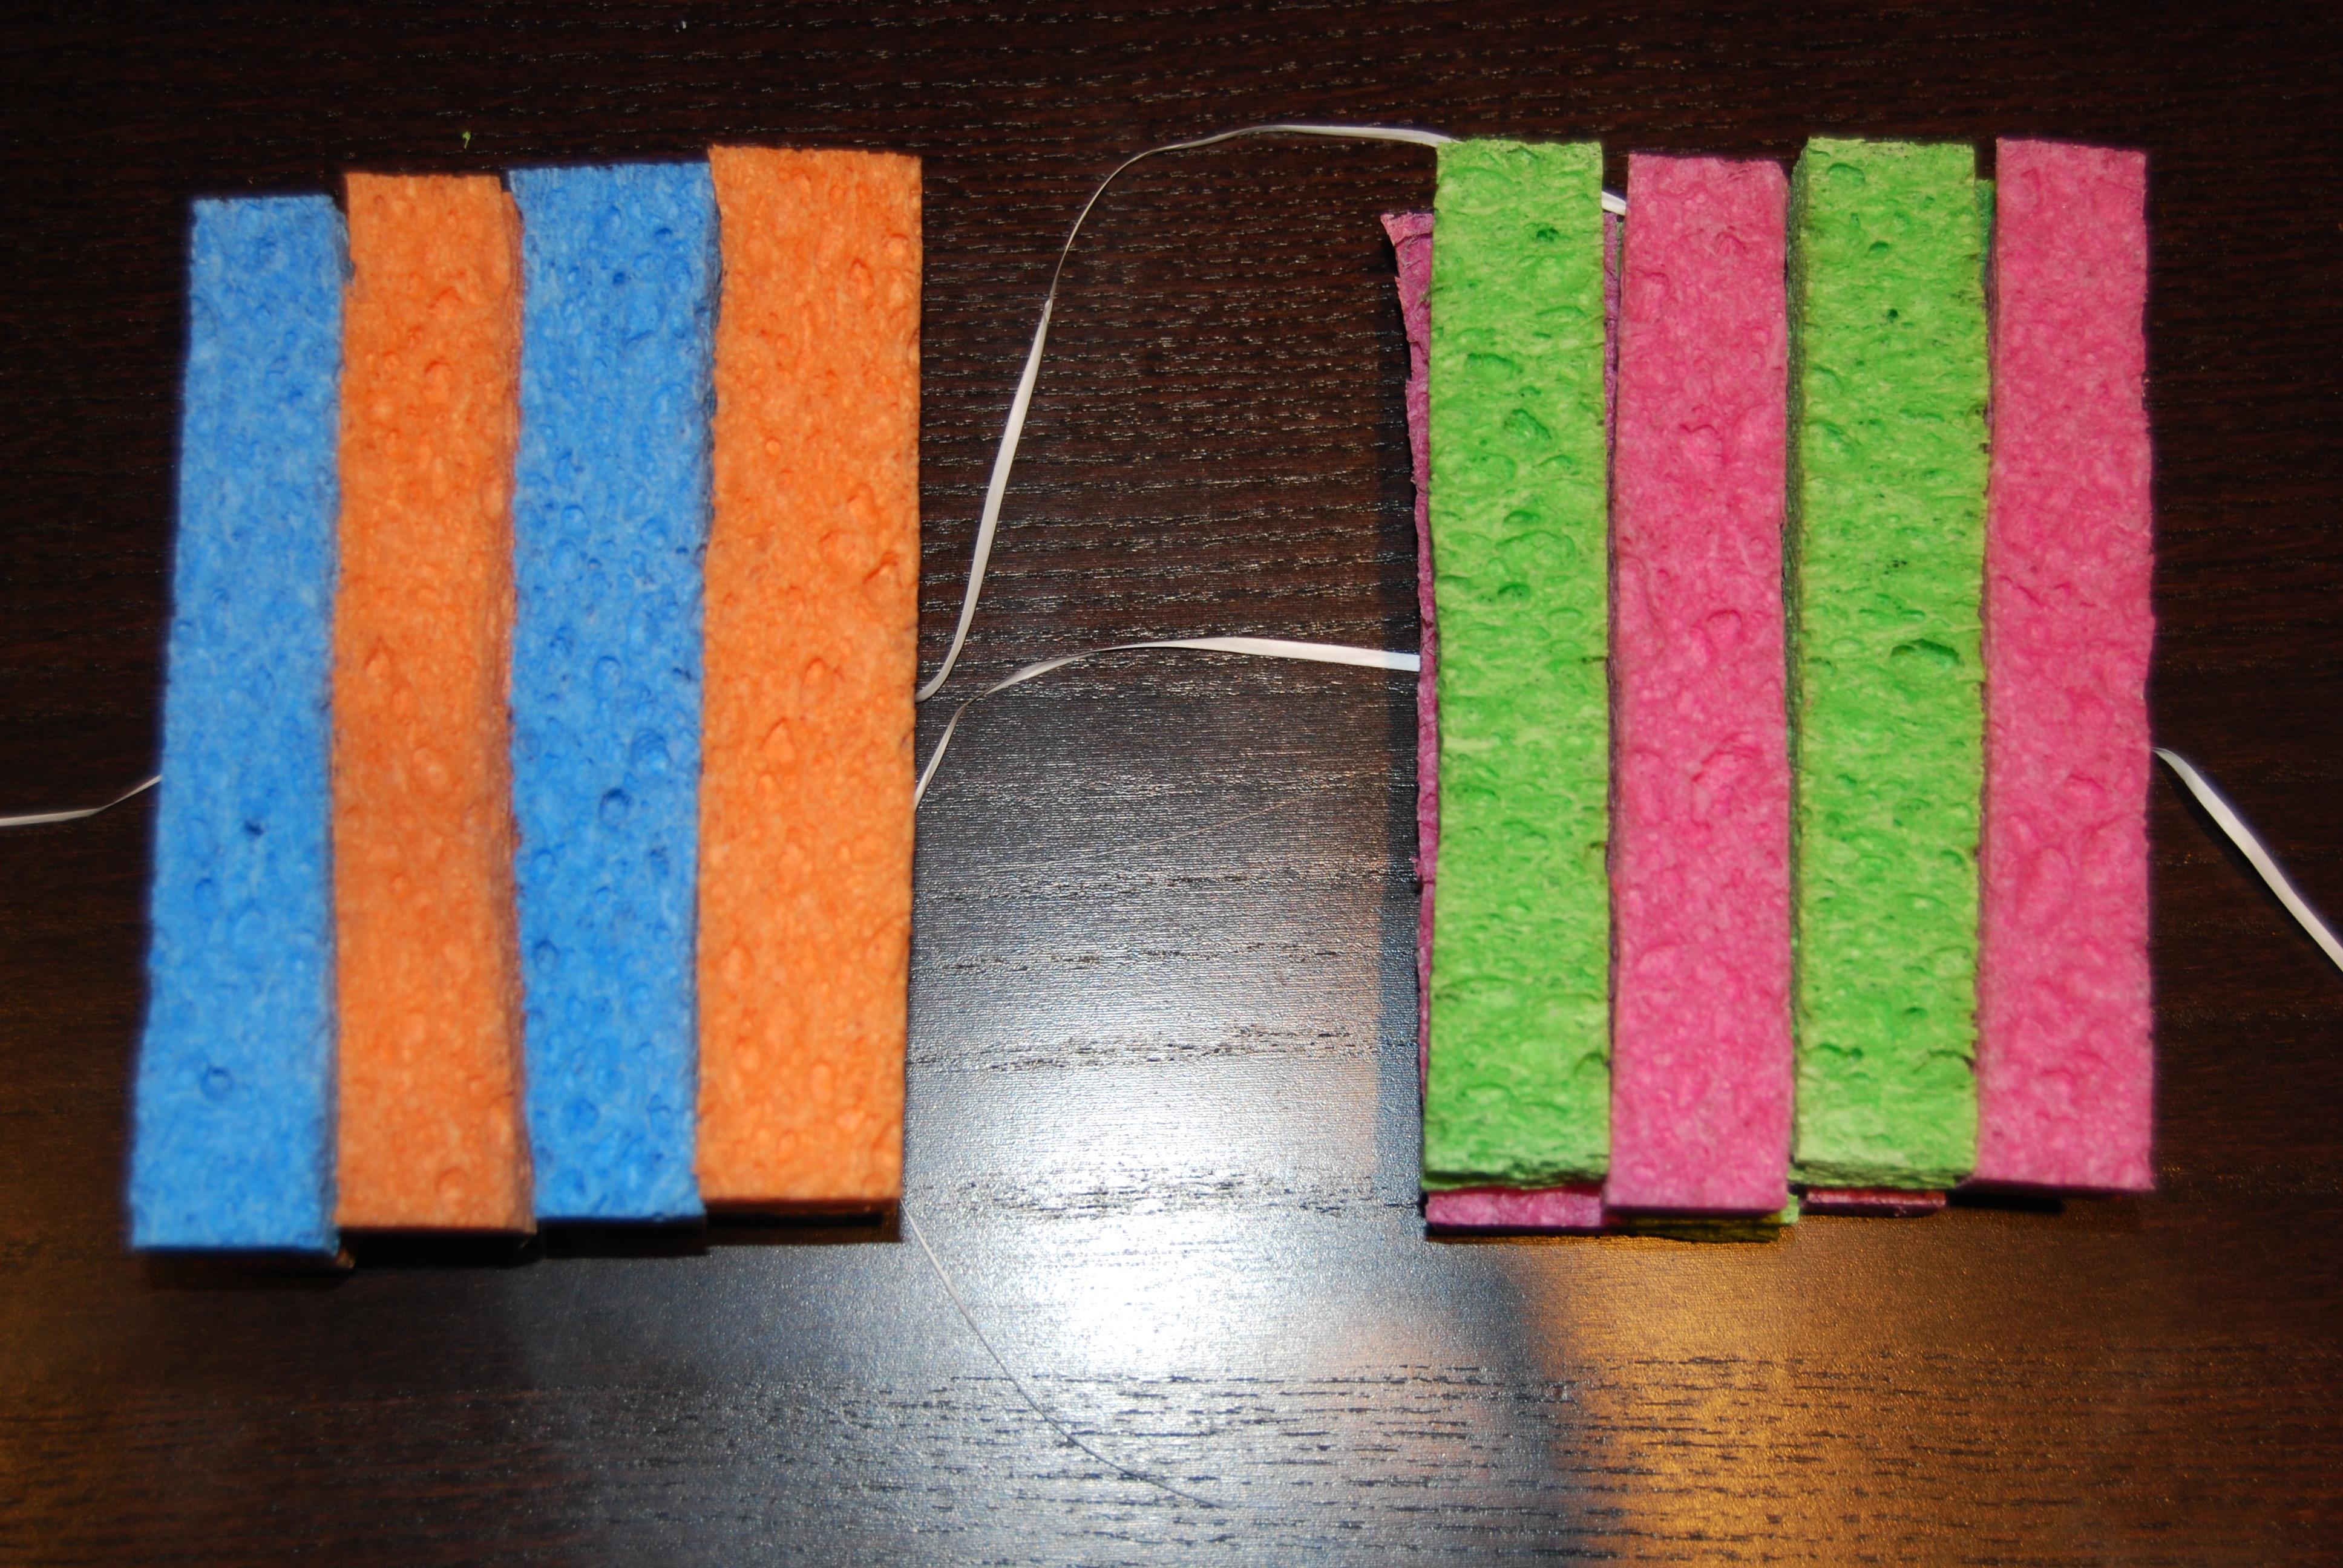 Stacks of eight sponge pieces